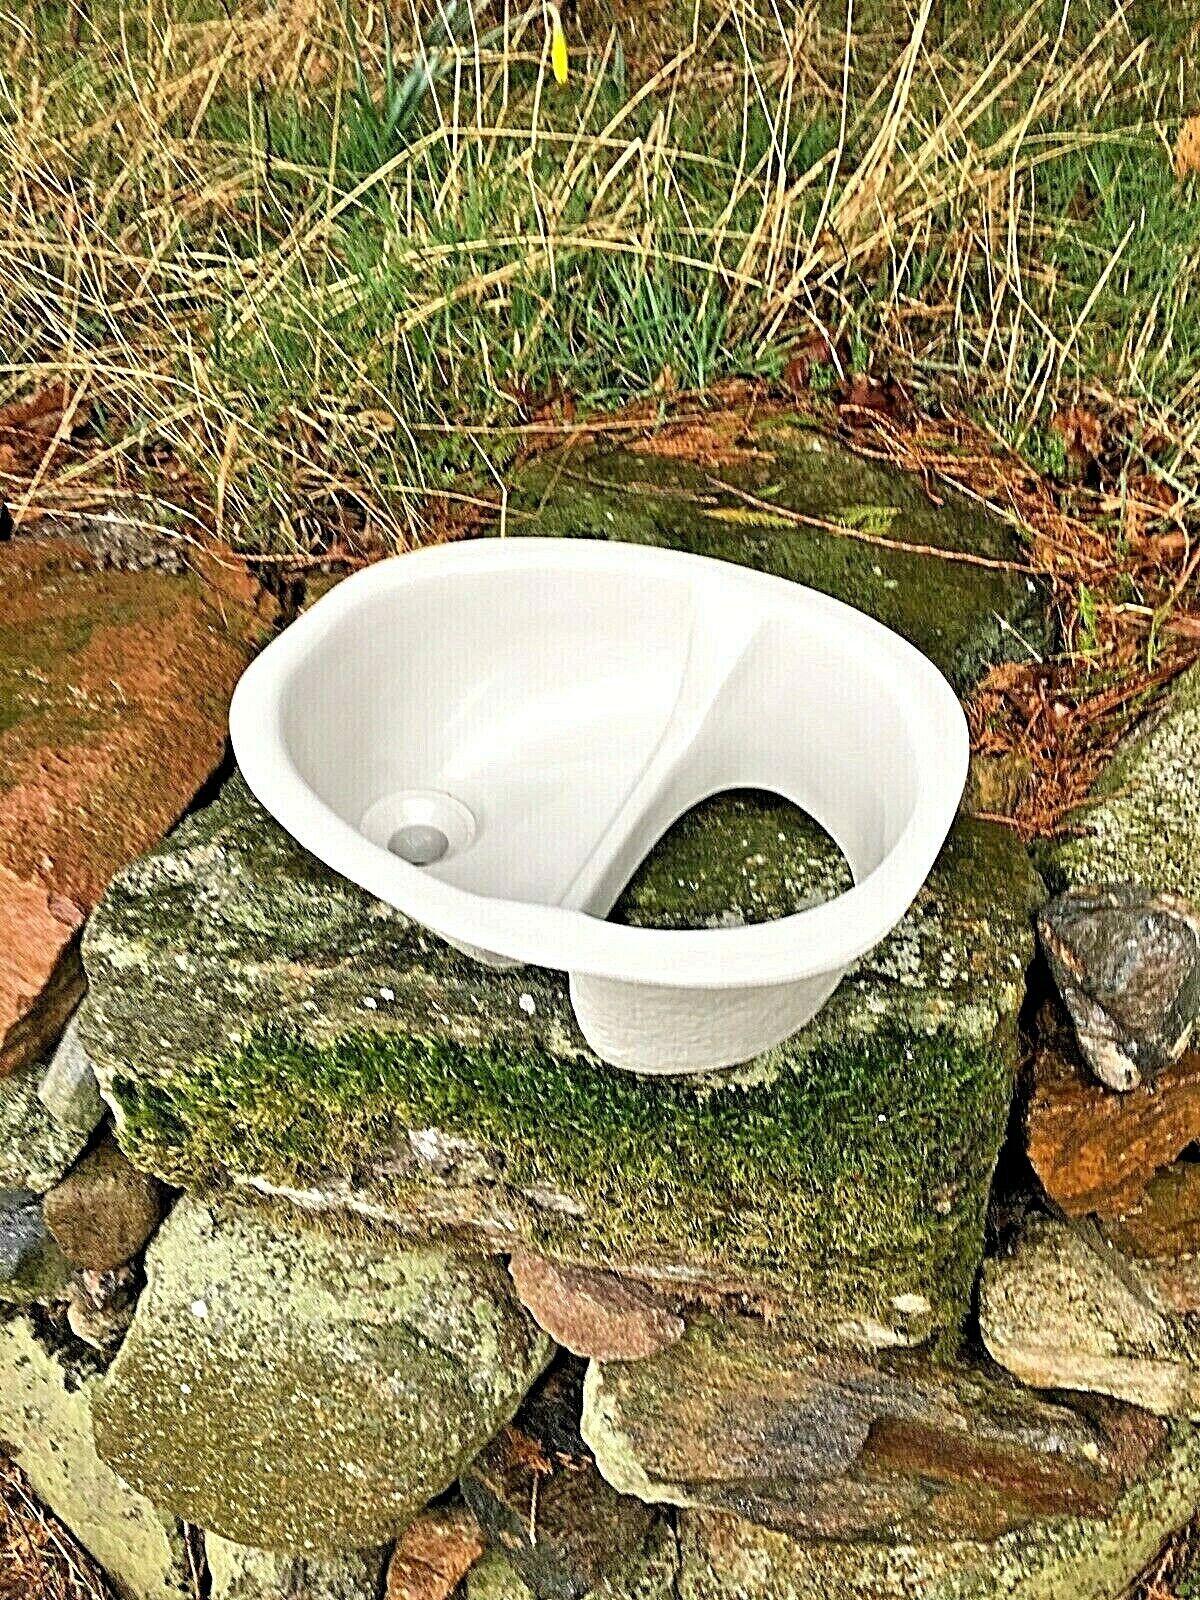 Compost Inodoro Separador de orina, Desviador Para Eco Inodoro de compostaje